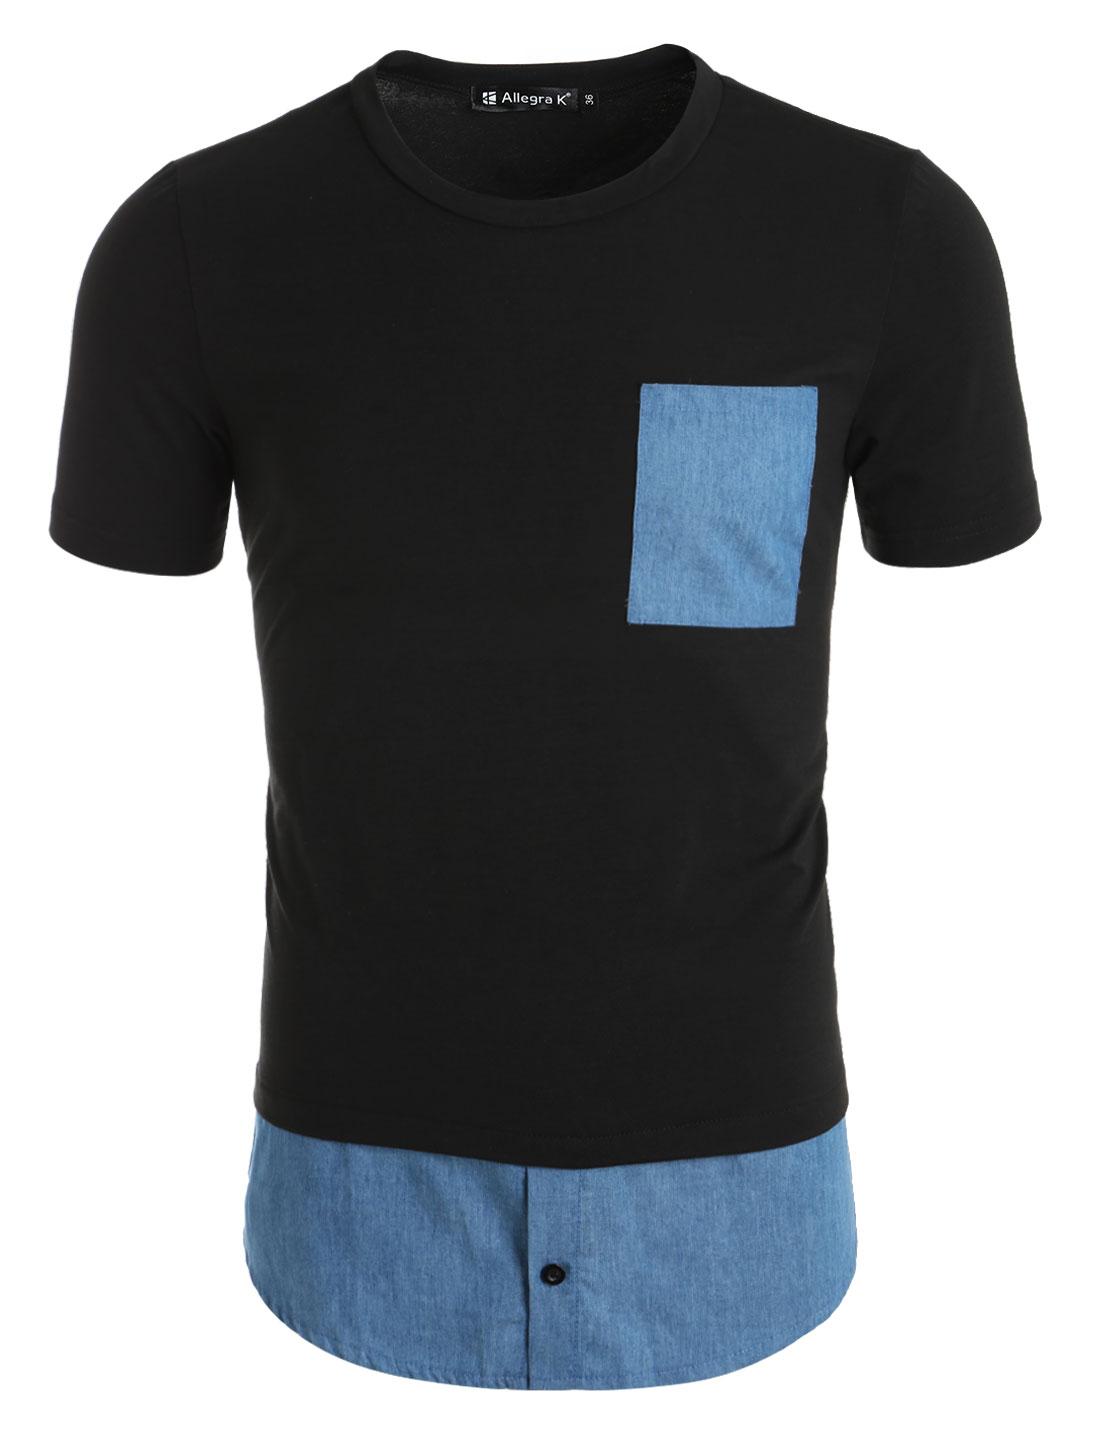 Men Short Sleeves Patch Pocket Round Neck Longline Tee Shirt Black L